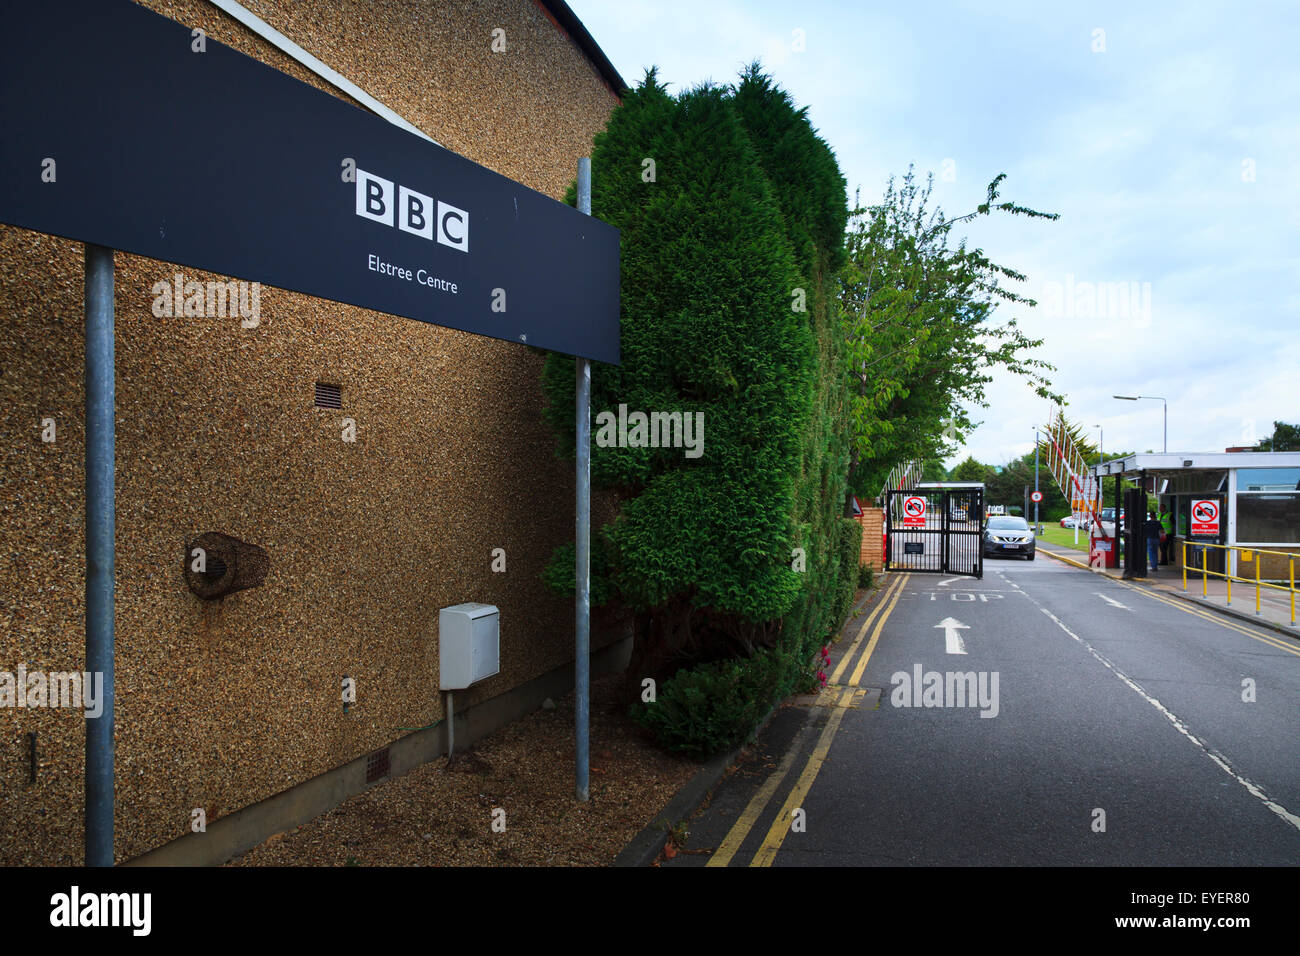 BBC Elstree Studios entrance and sign Stock Photo